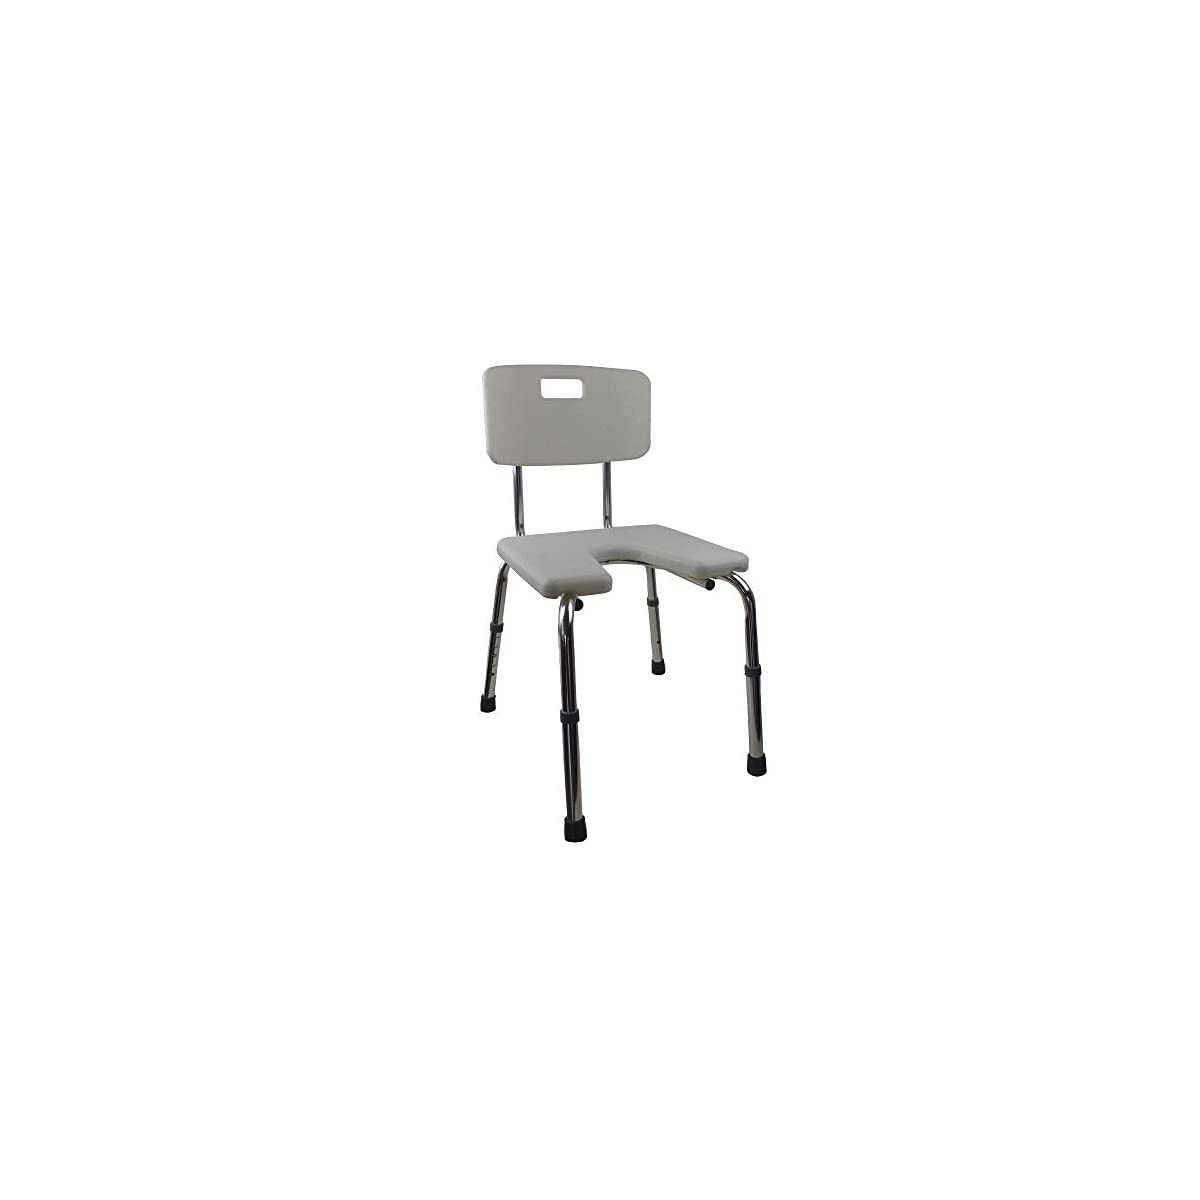 31aAshHrrVL. SS1200  - Silla de baño | Altura regulable | Respaldo | Asiento en U | Marisma | Mobiclinic